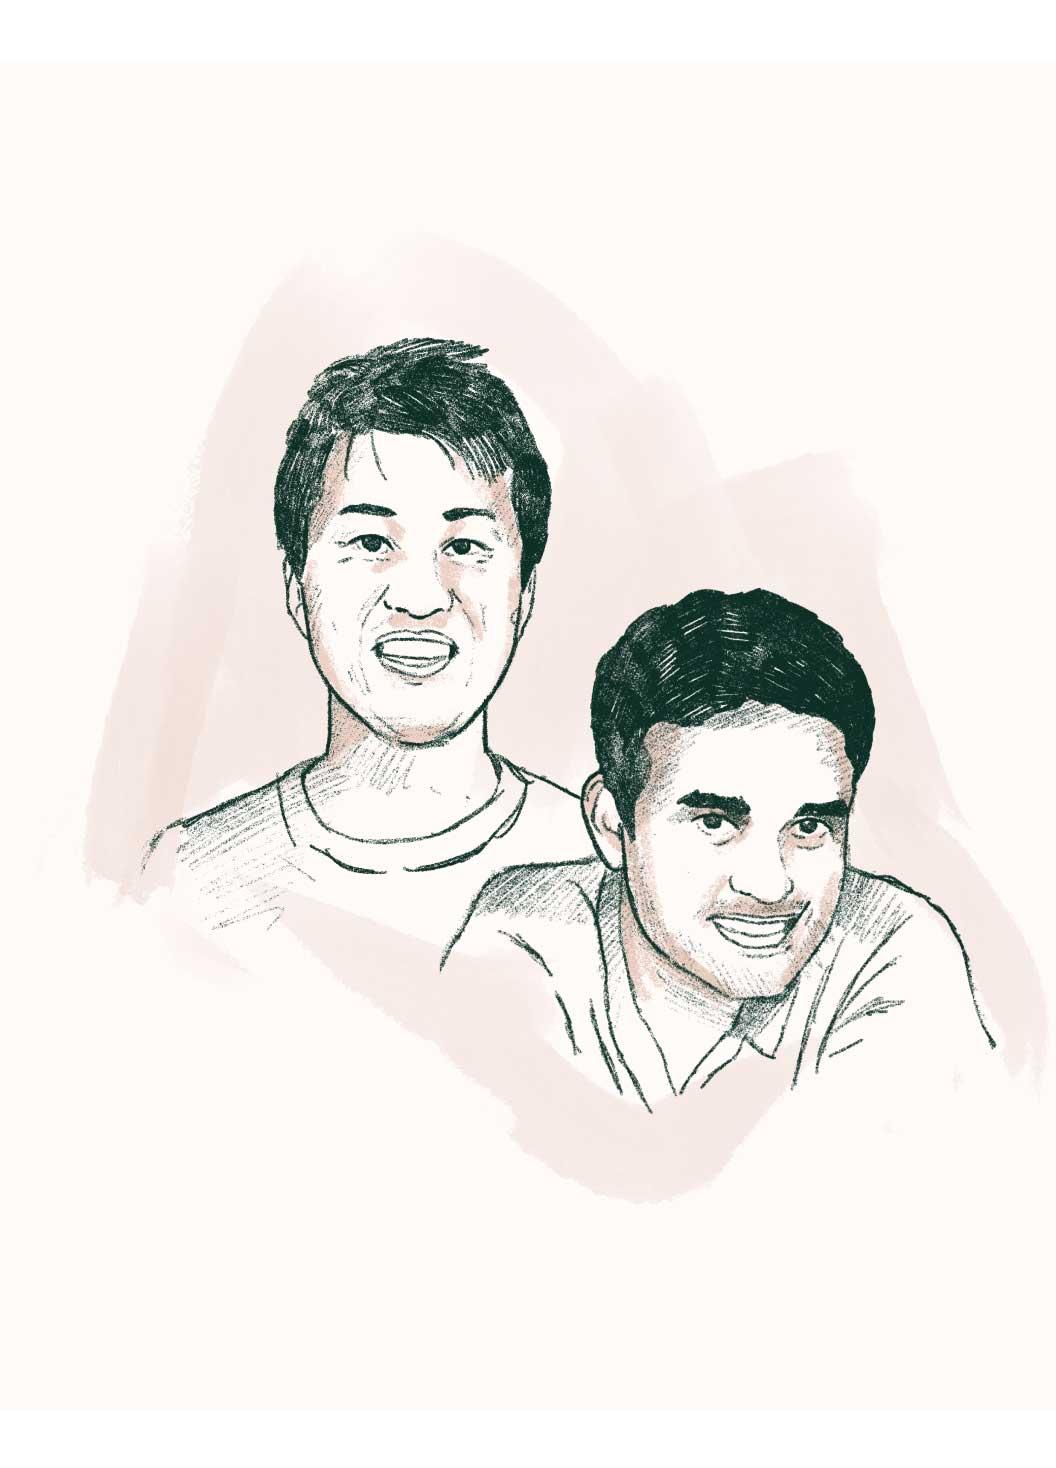 Leo Sanada and Pradeep Gaddam sketch illustration